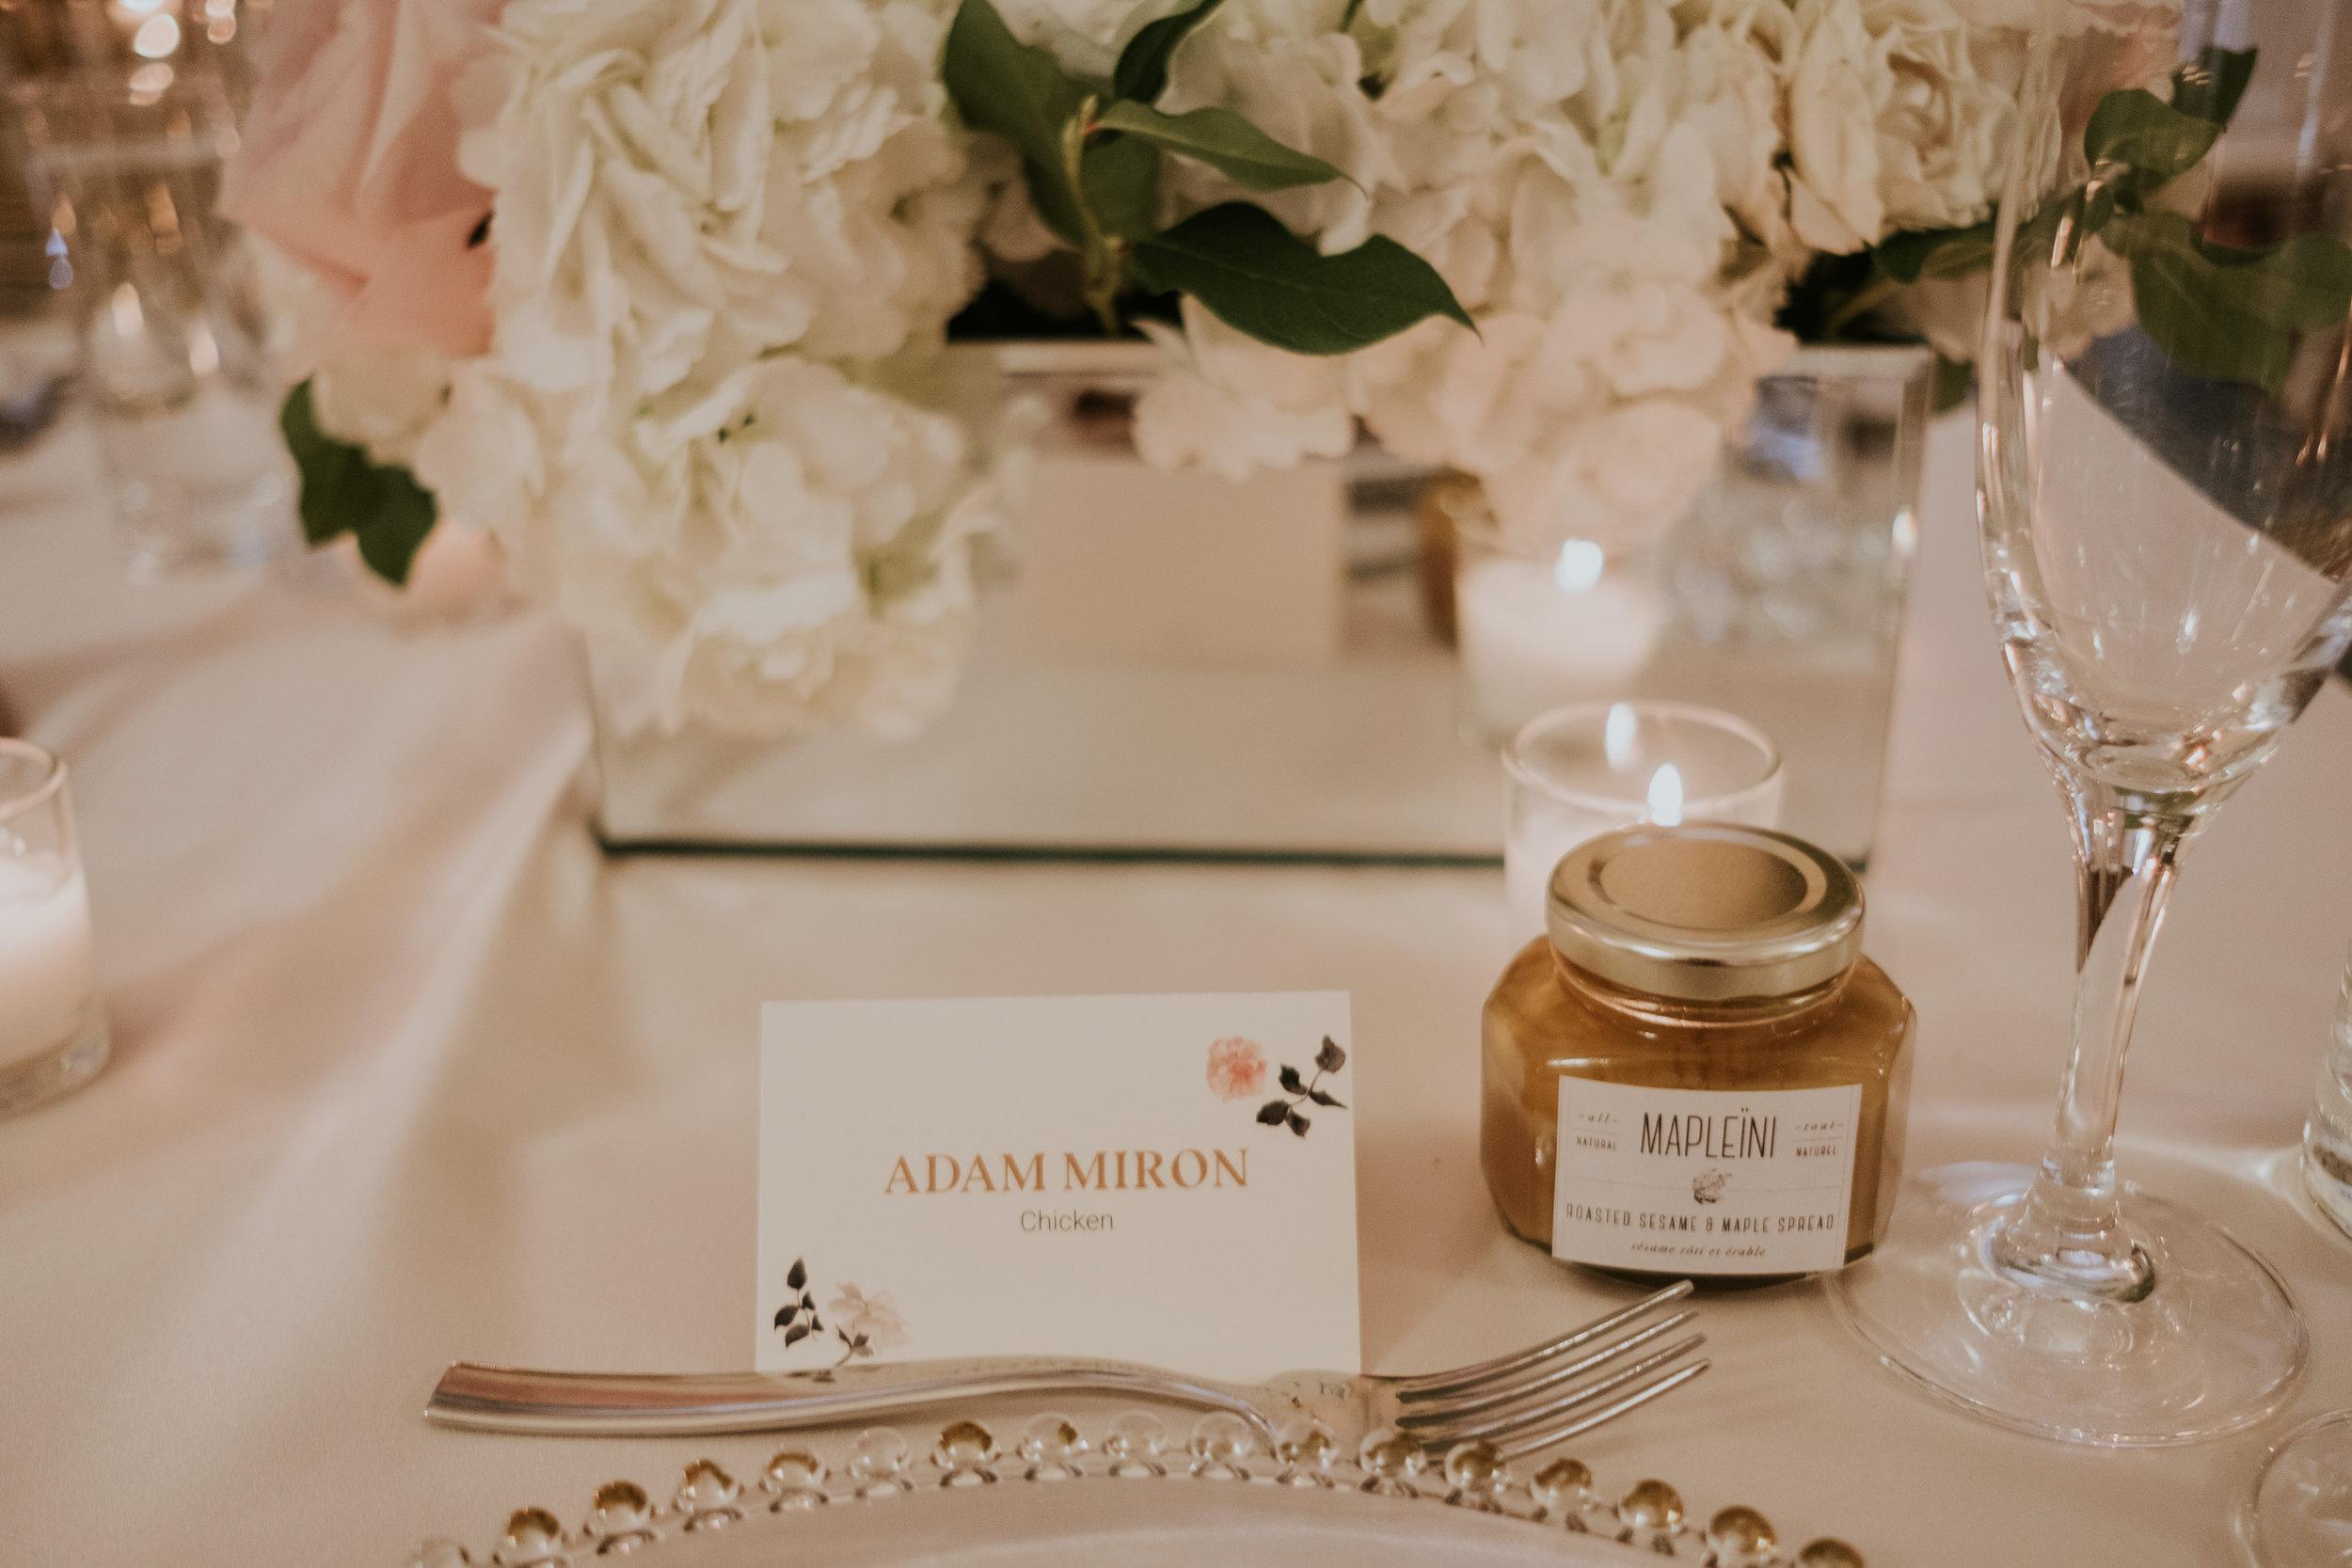 Komal Minhas Wedding Chateau Laurier, Toast Events, reception ballroom